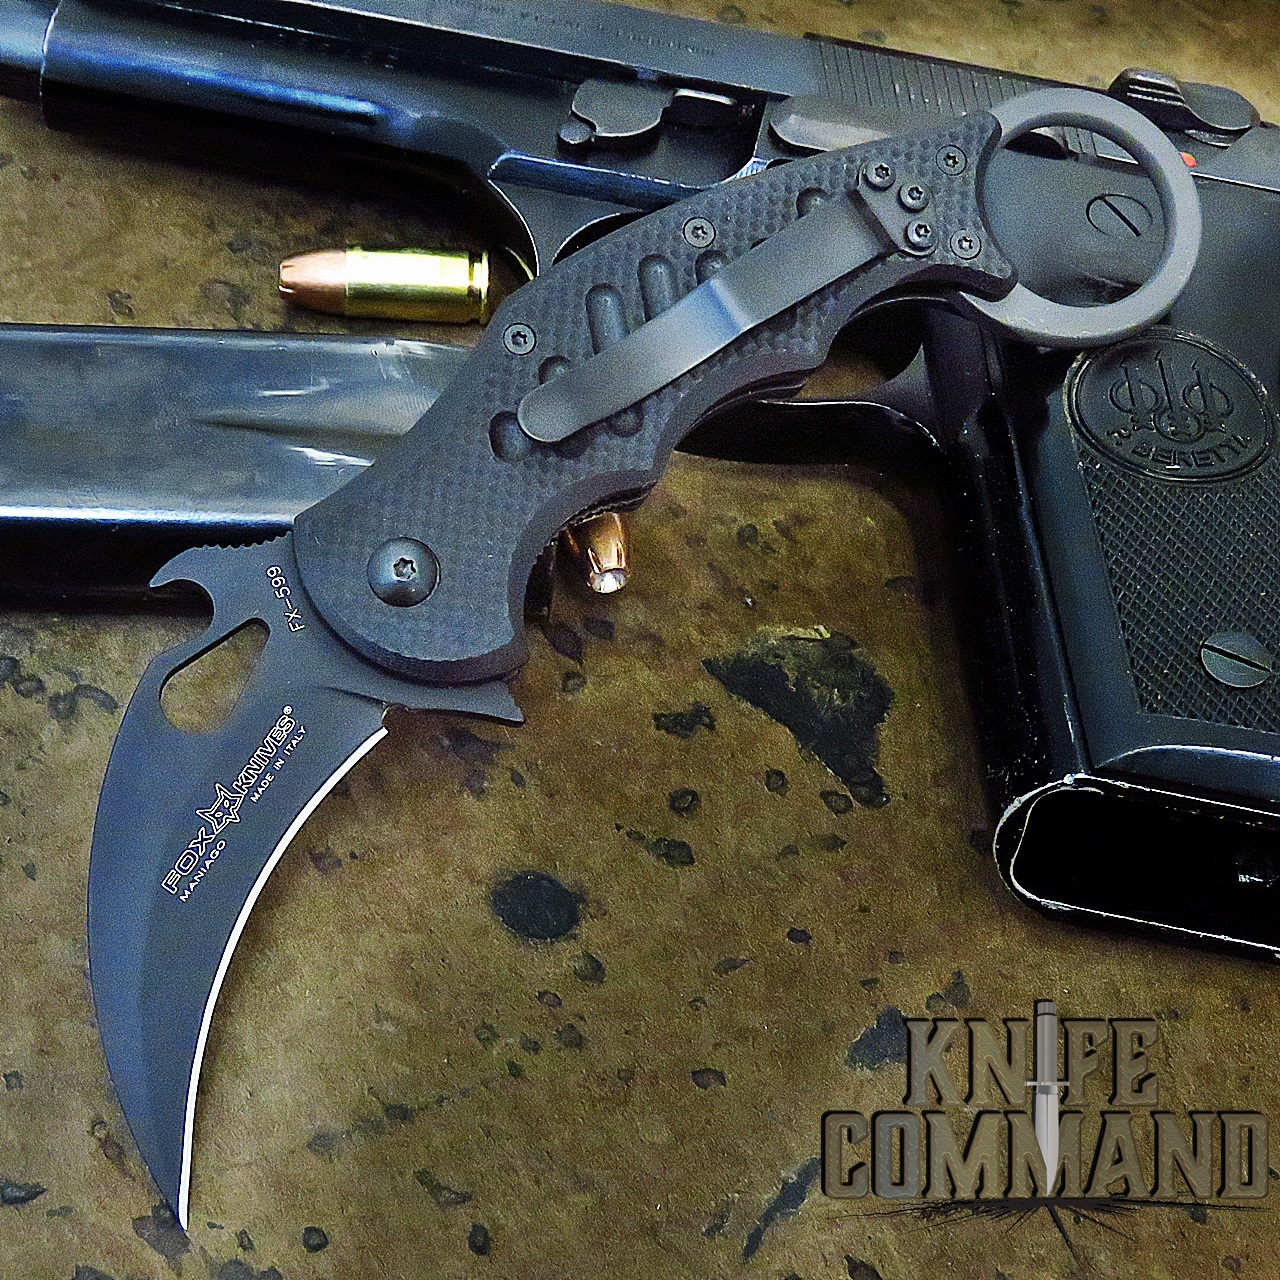 Fox Knives FX-599 Small Folding Karambit Knife Black G10 - Emerson Wave